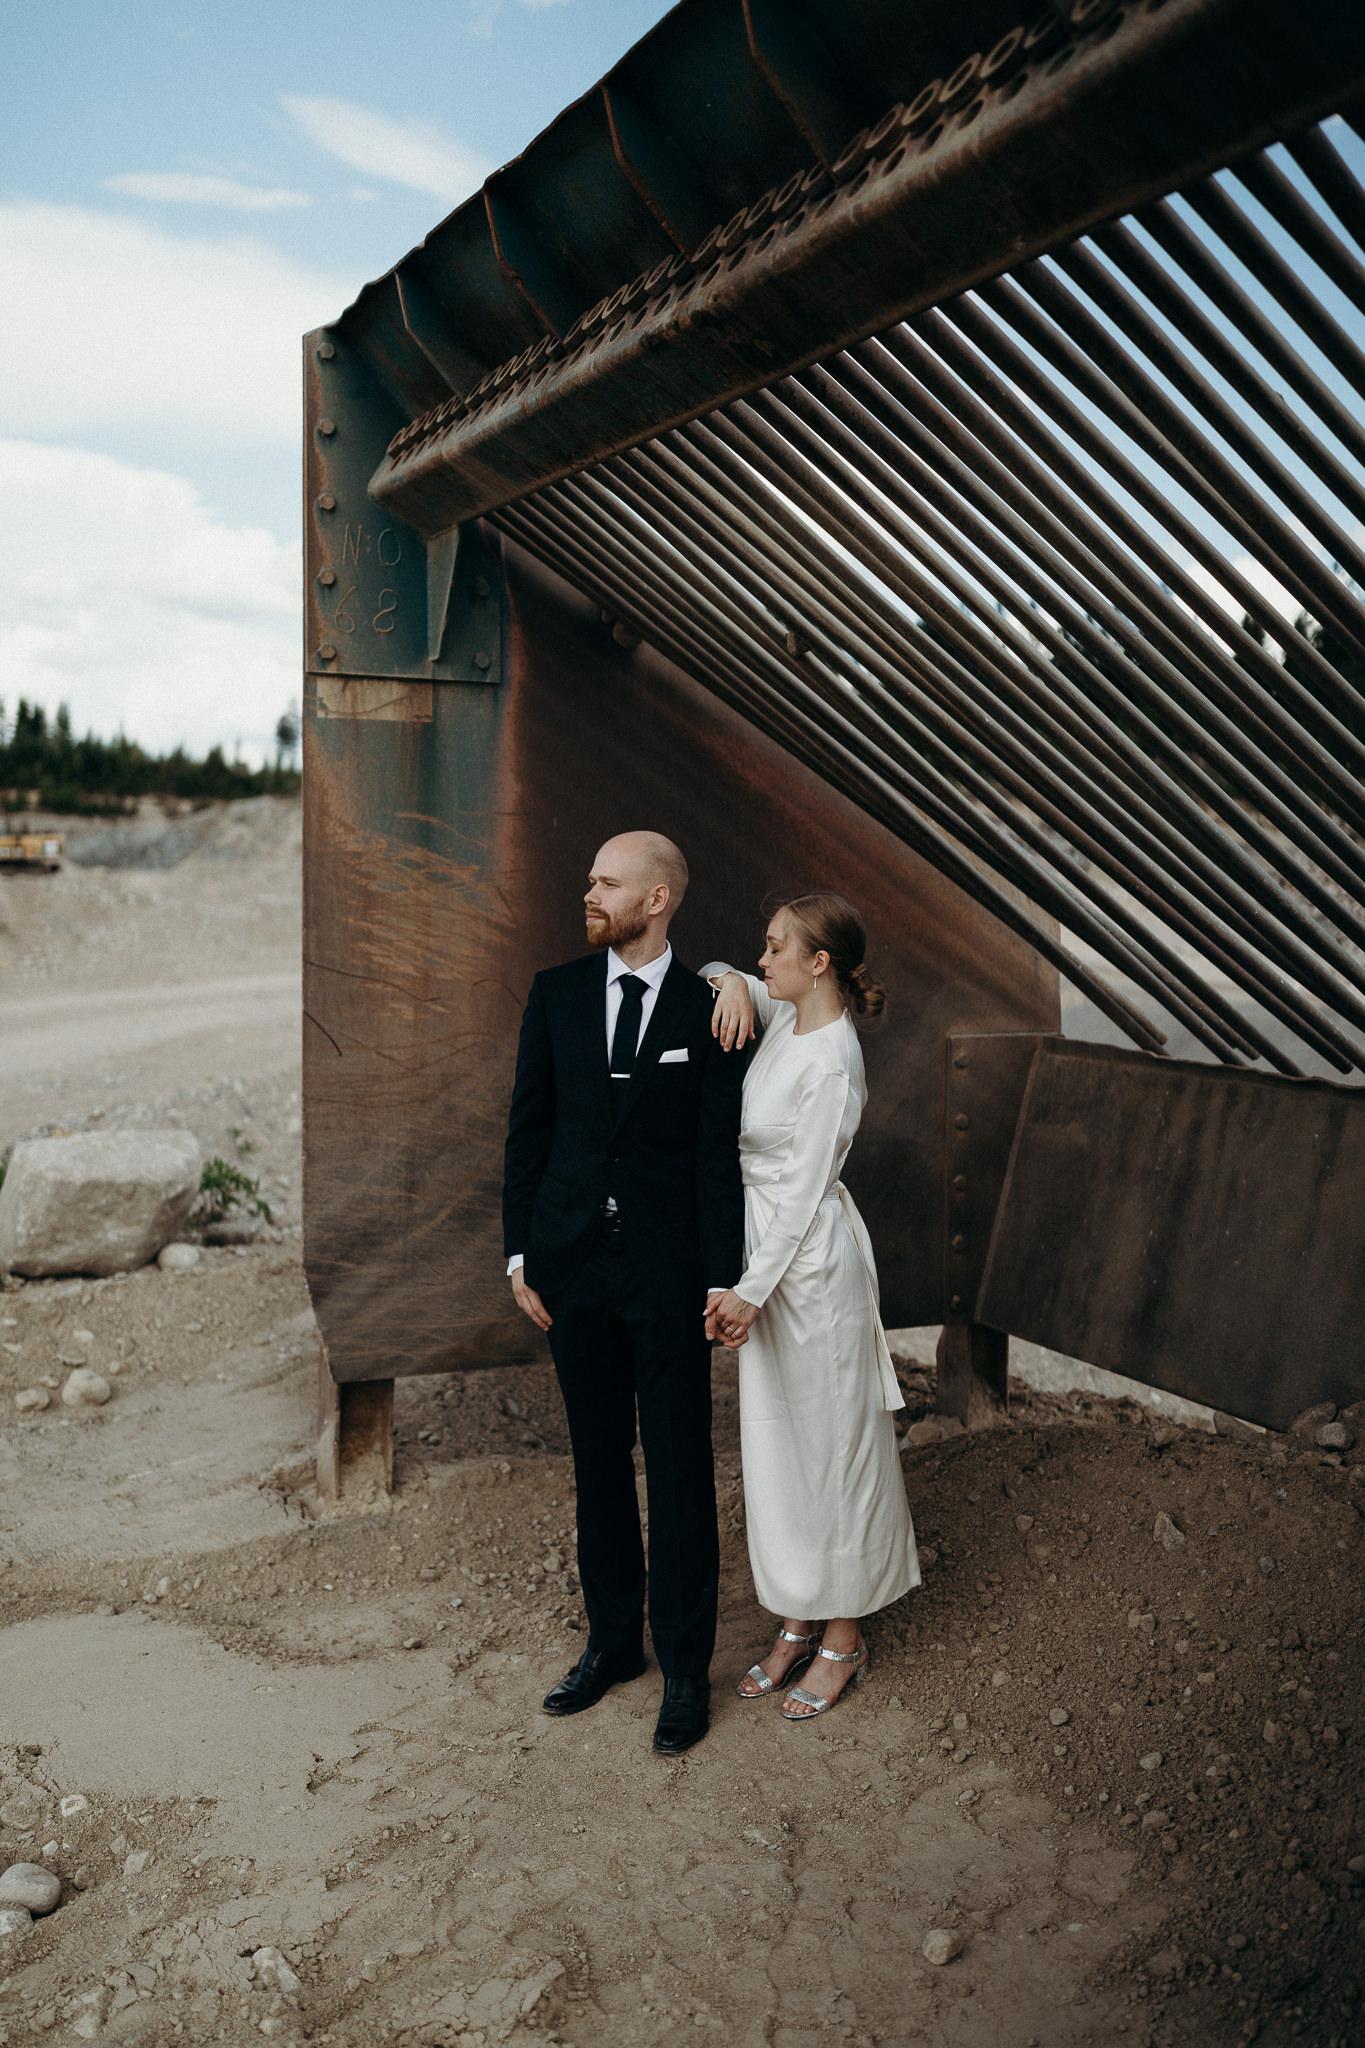 Full day documentary wedding